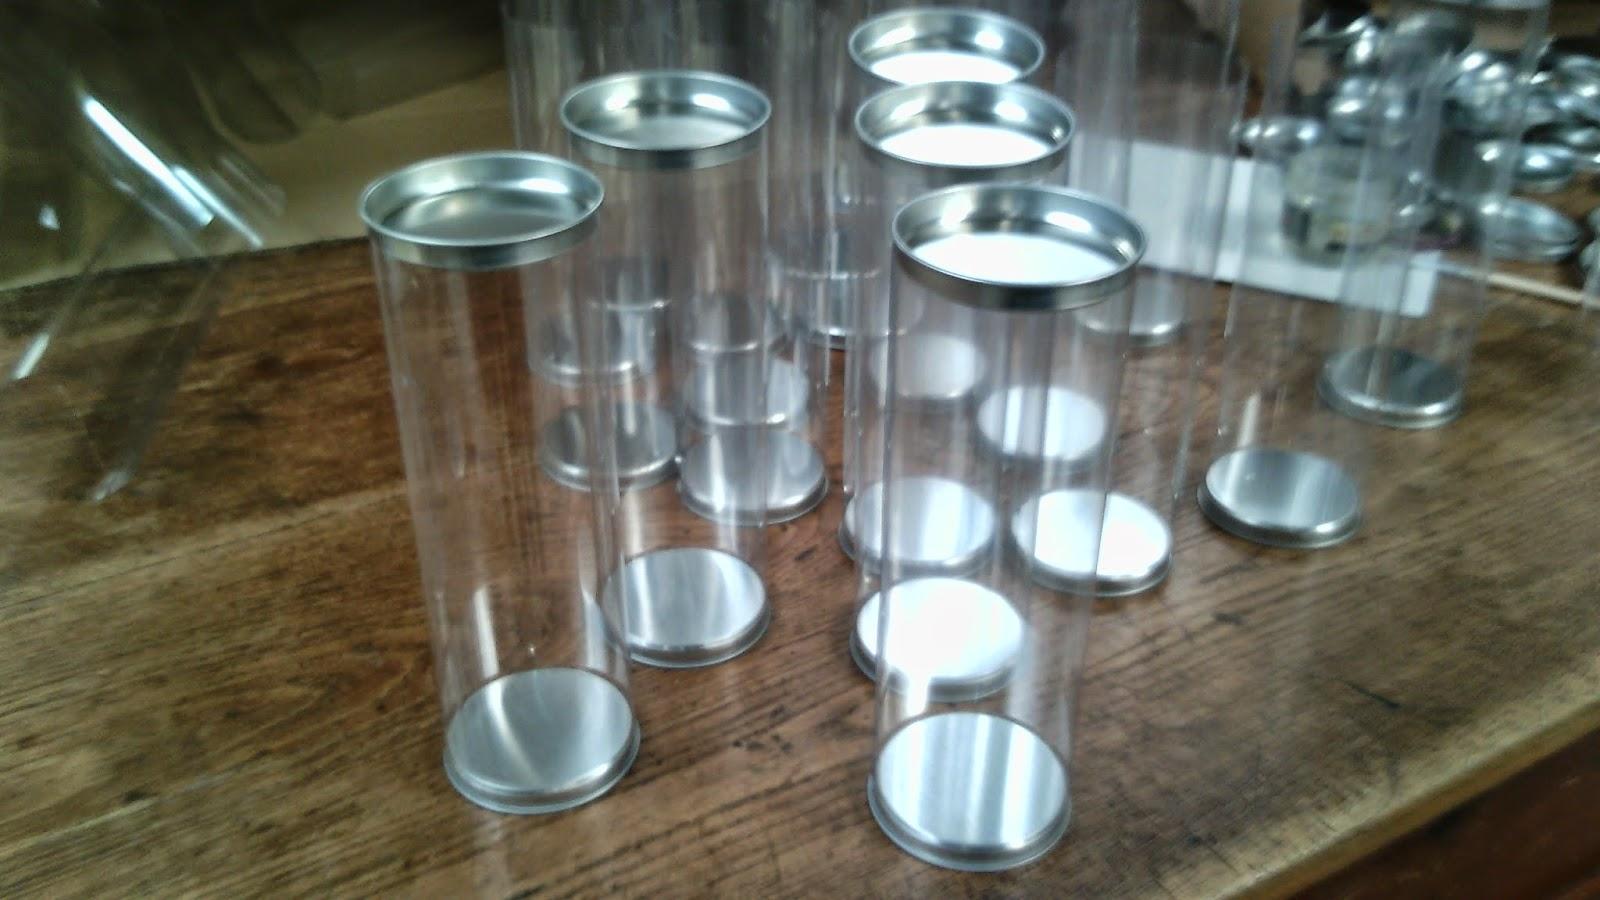 Papel line 12 cajas de pl stico envases pvc acetato - Tubos cuadrados de pvc ...